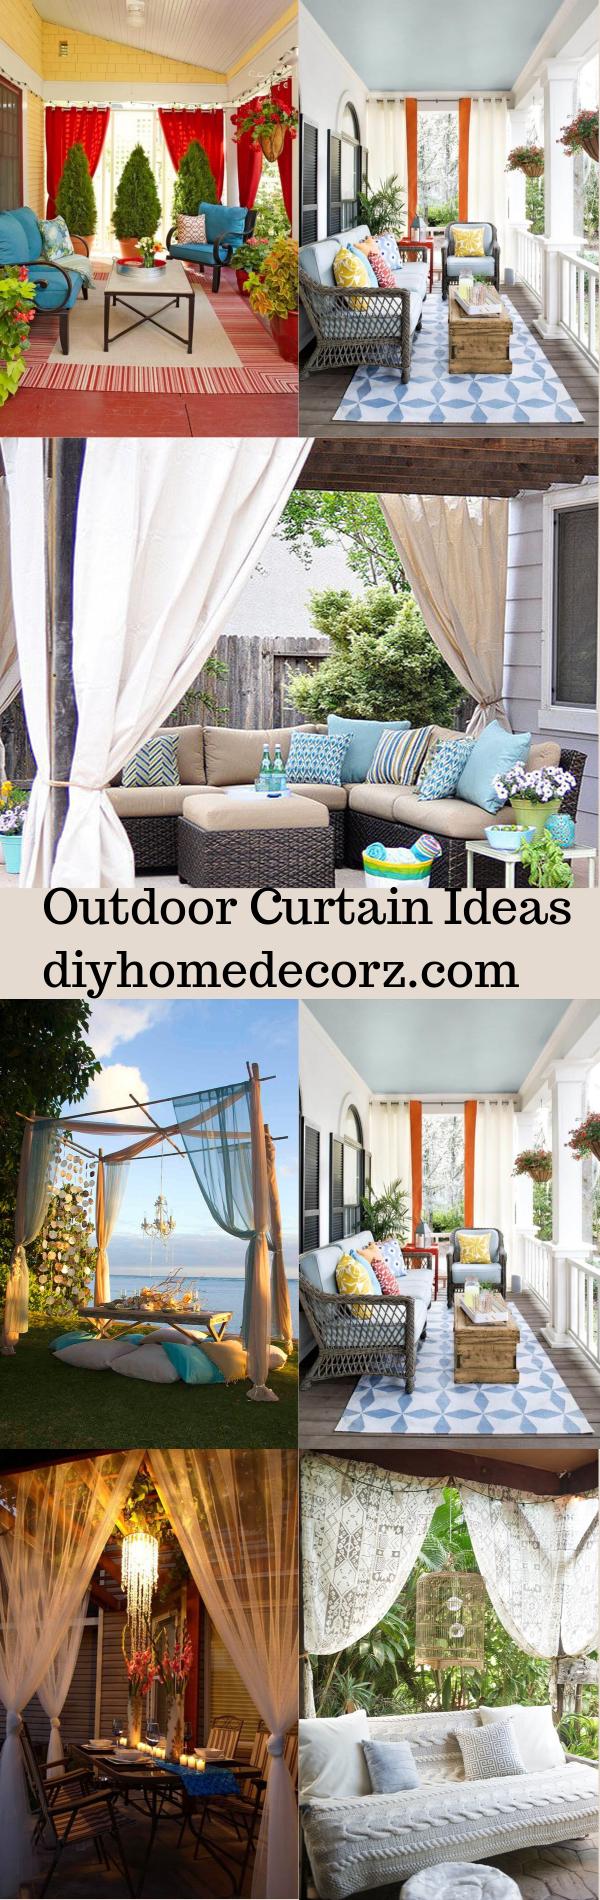 Outdoor Curtain Ideas